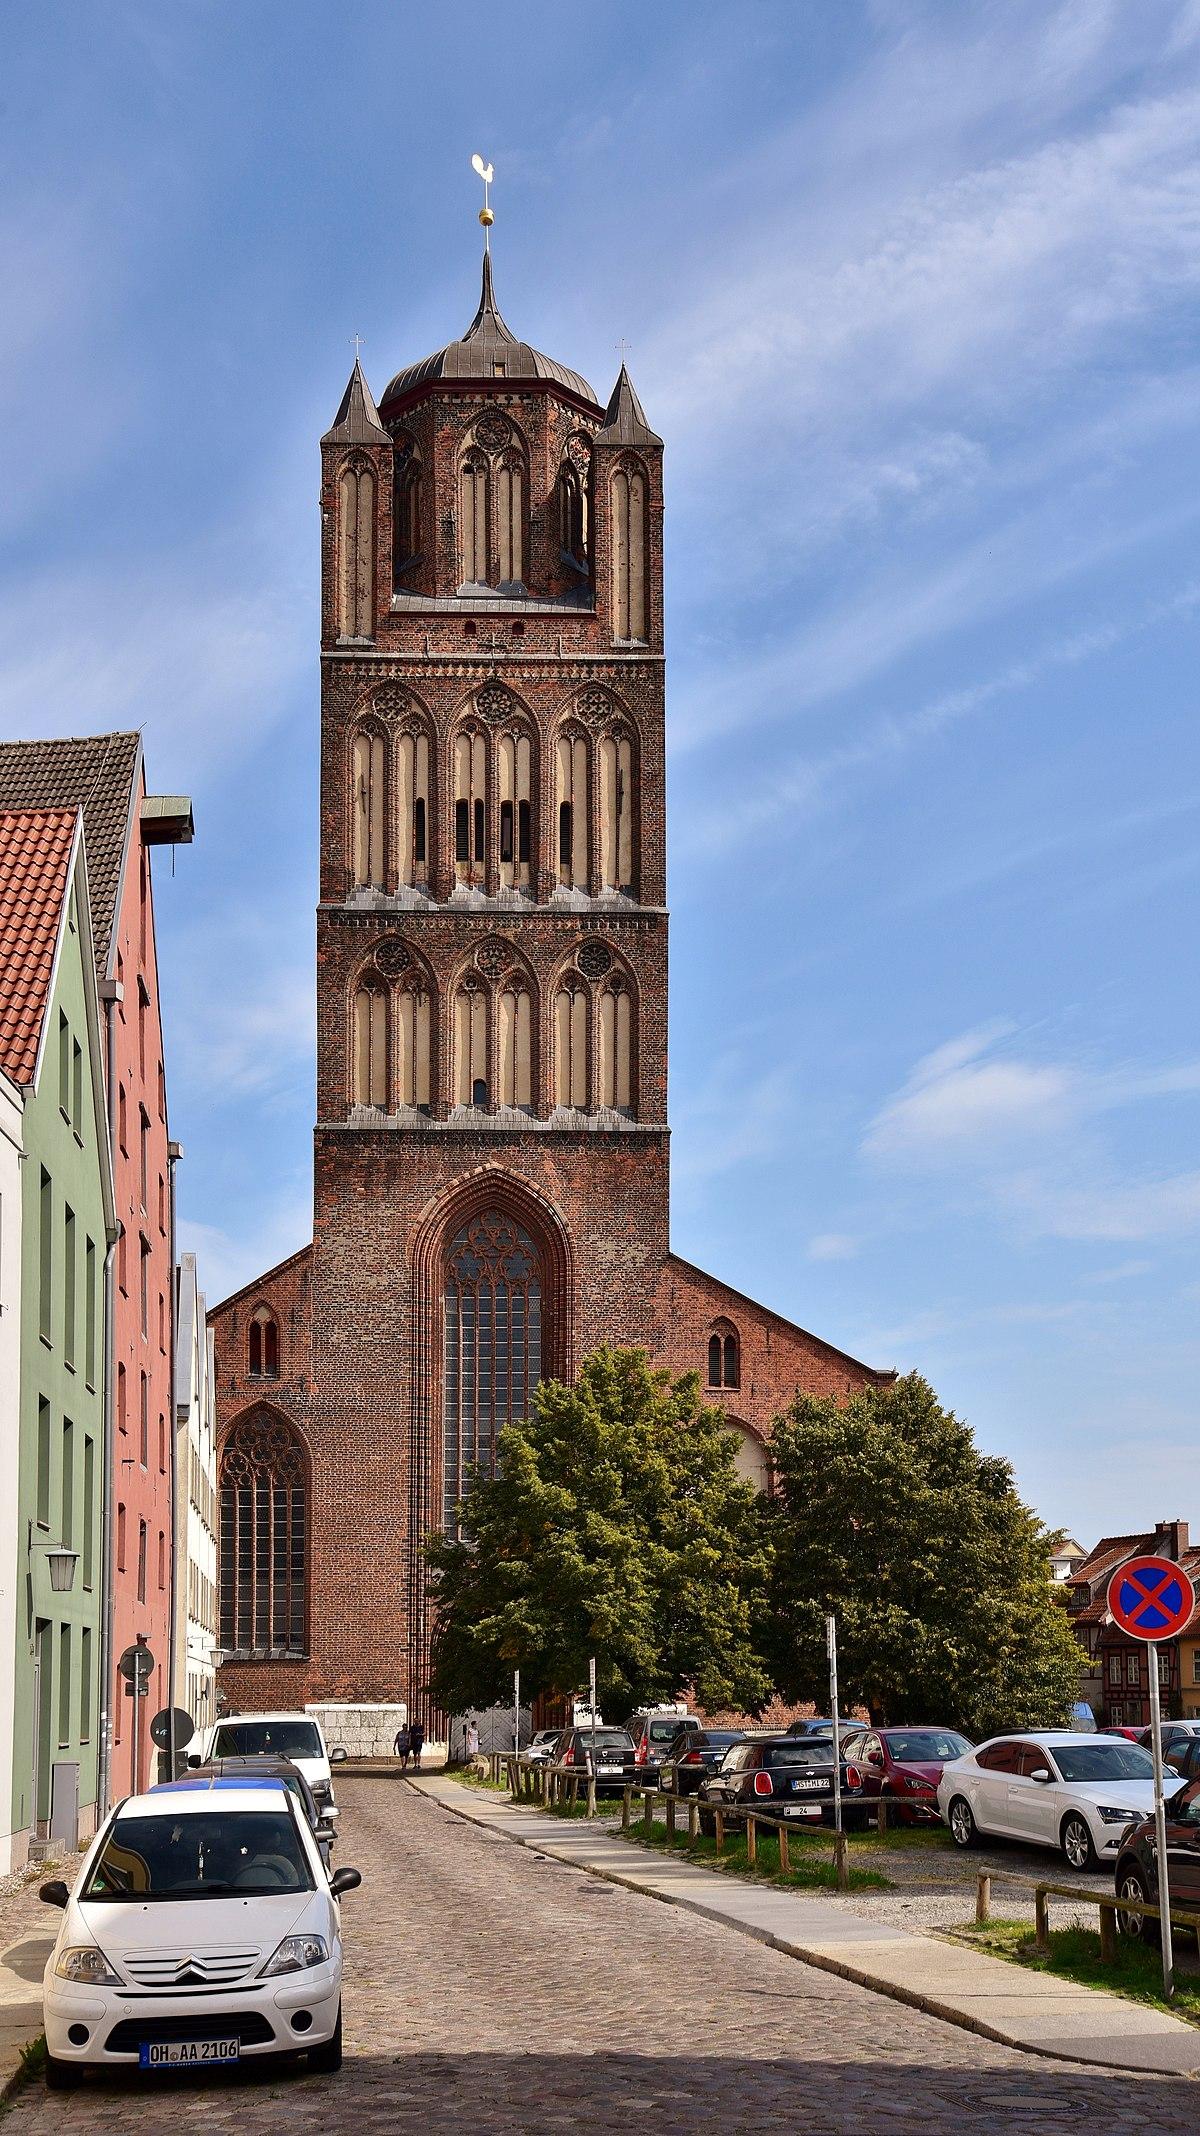 File:St Jakobi in Stralsund, 2019 (01).jpg - Wikimedia Commons